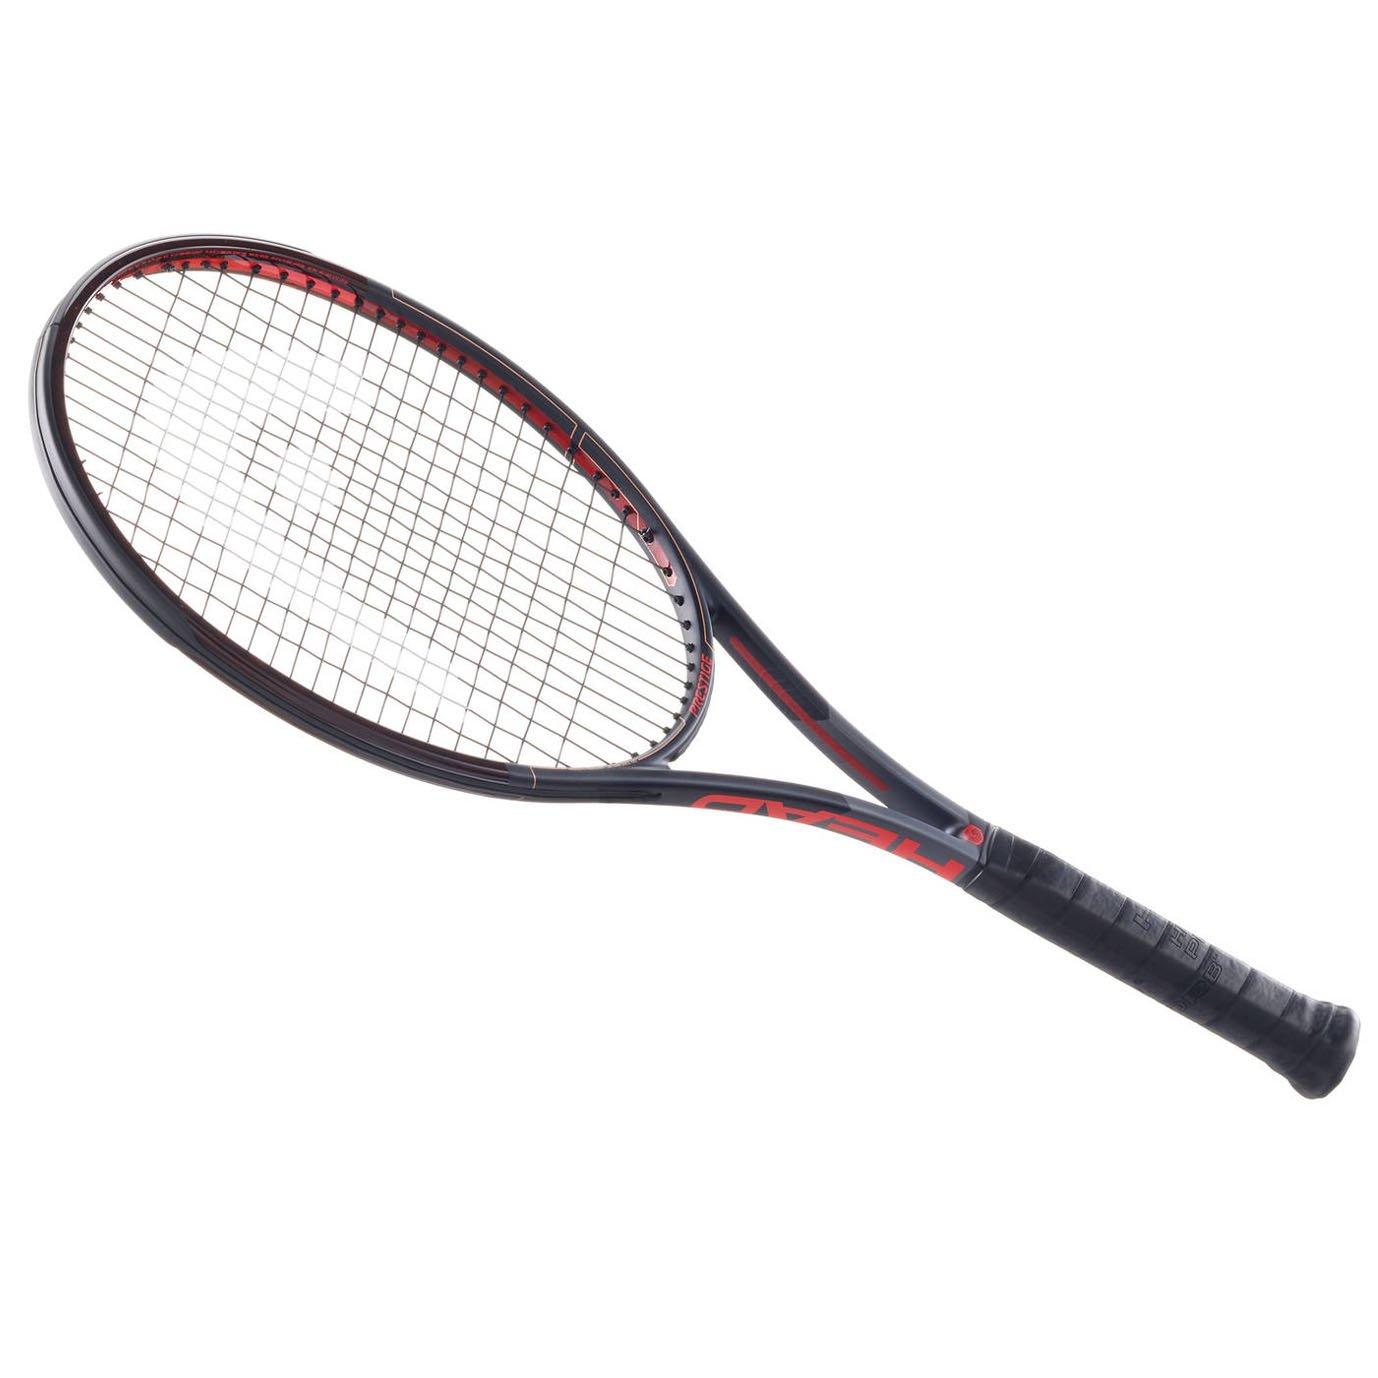 HEAD Graphene Touch Prestige MID Tennis Racket